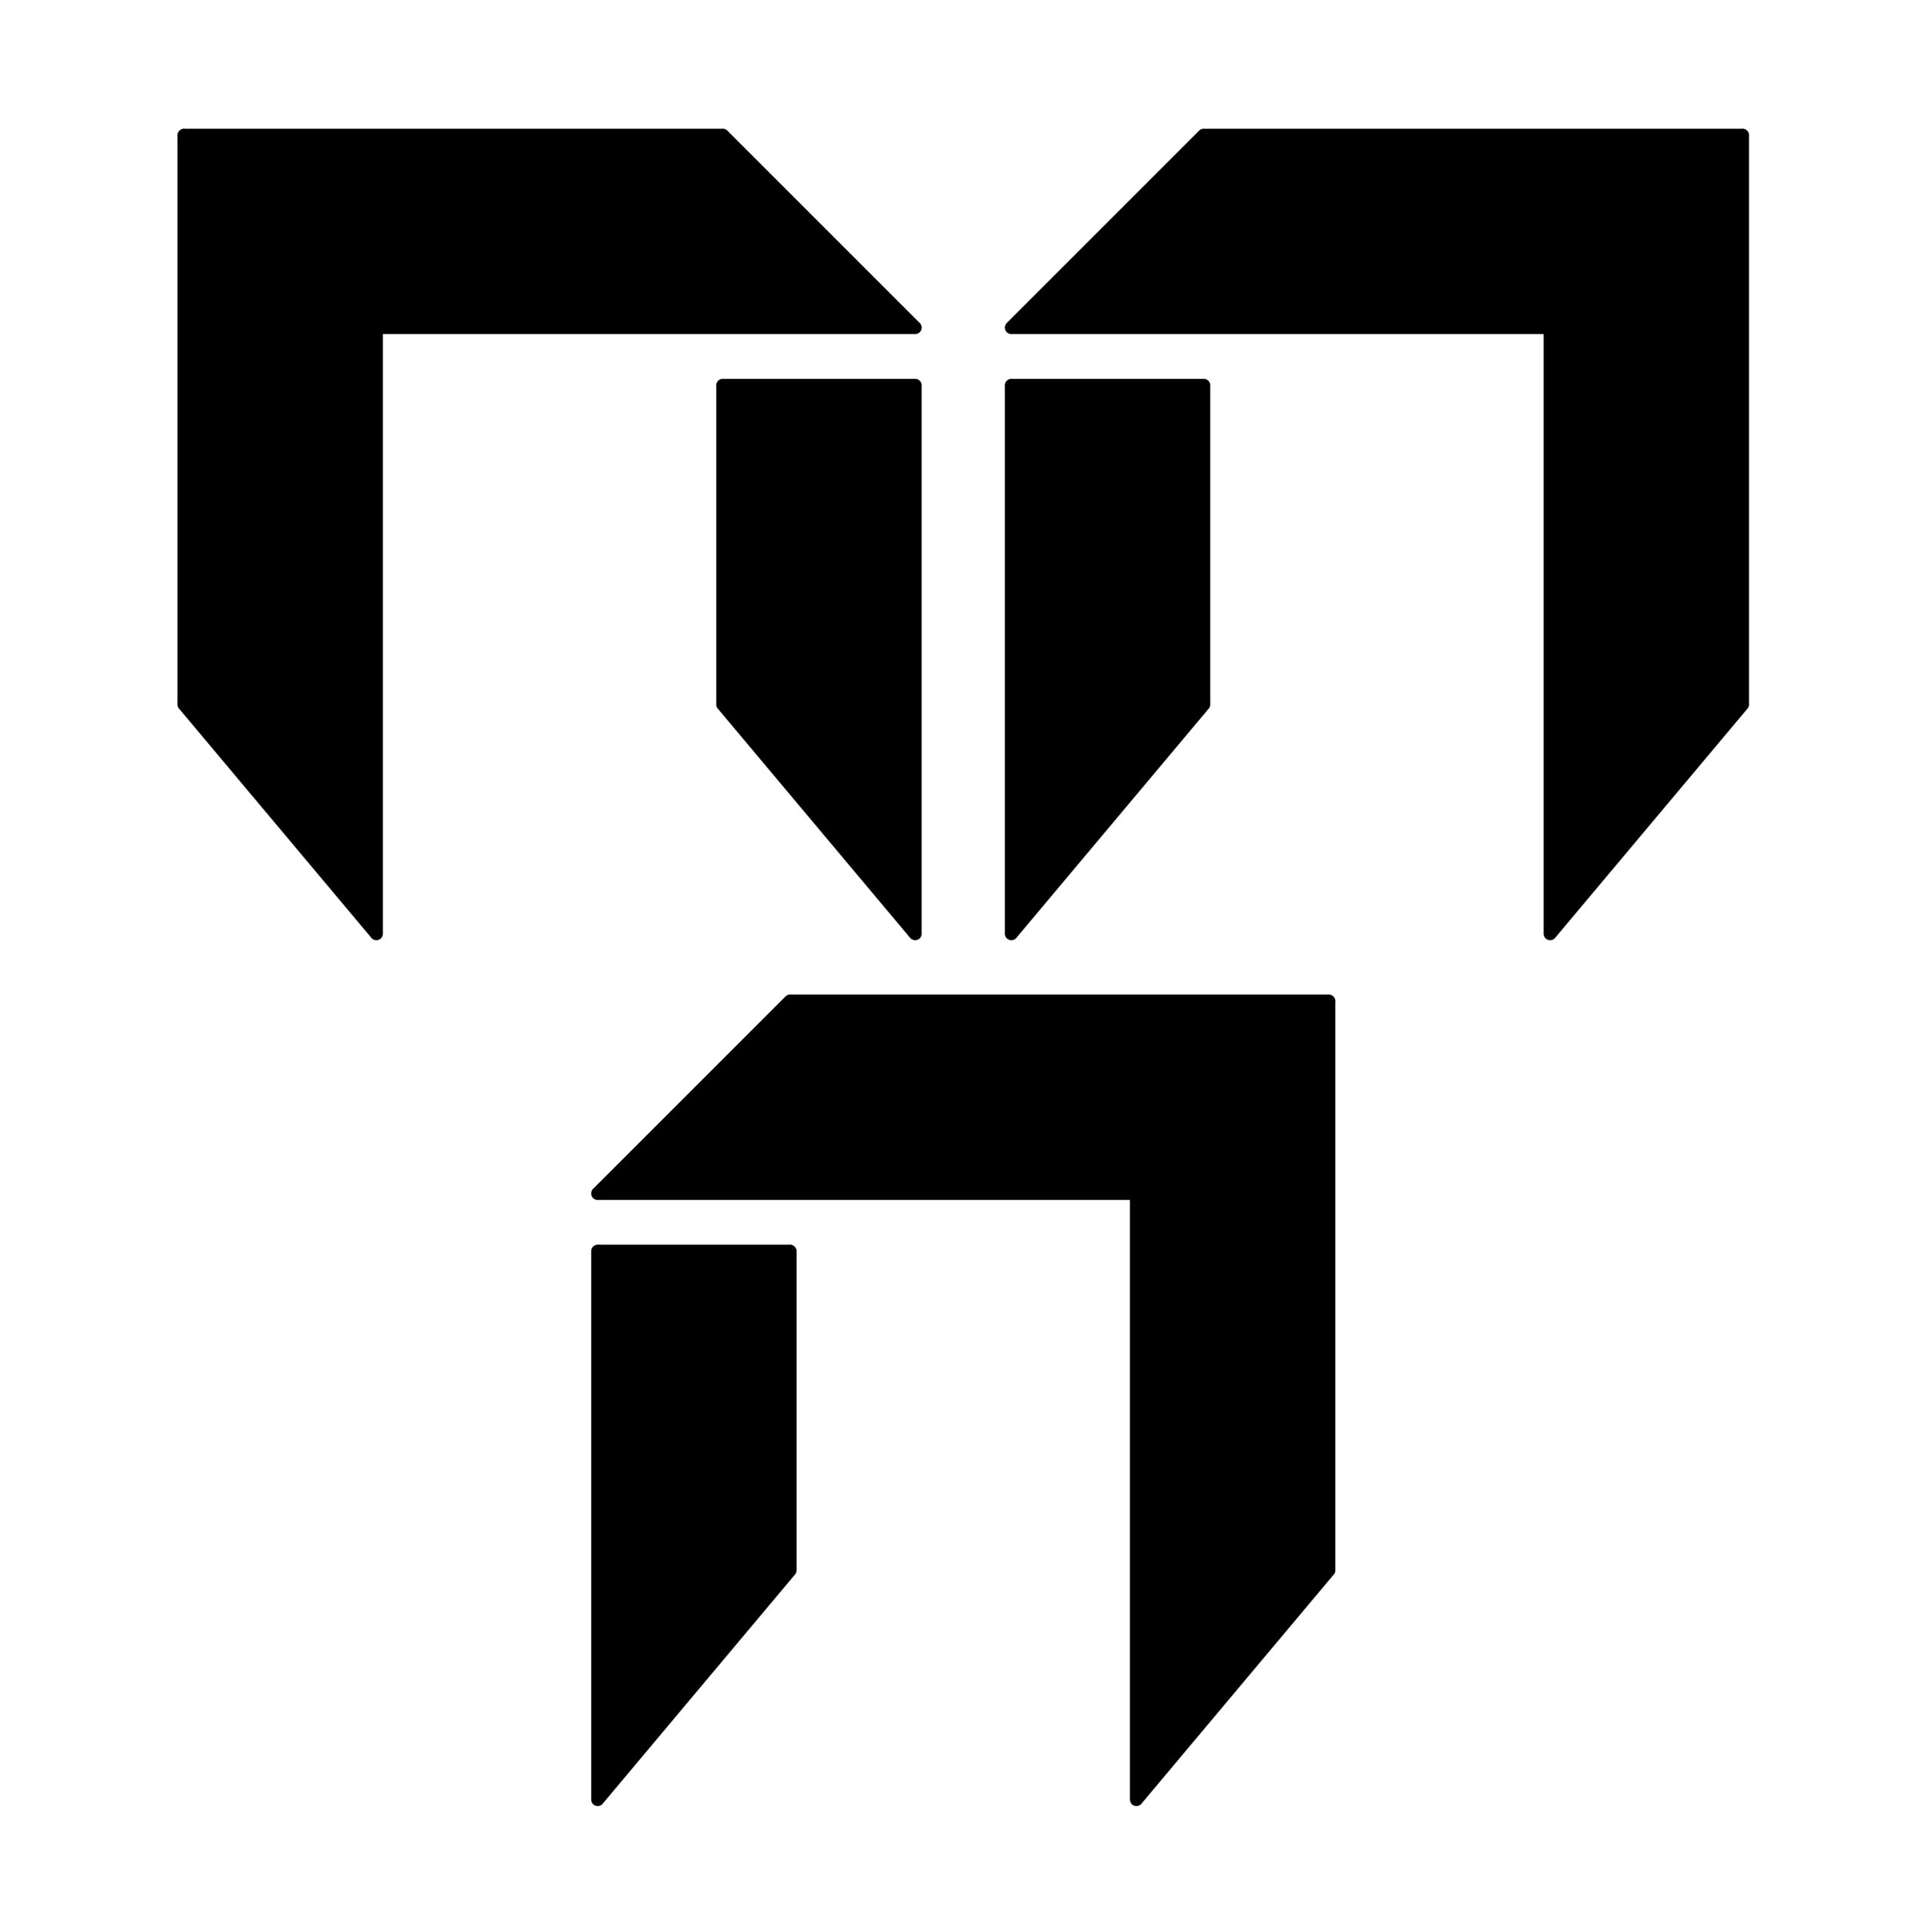 Логотип заявителя